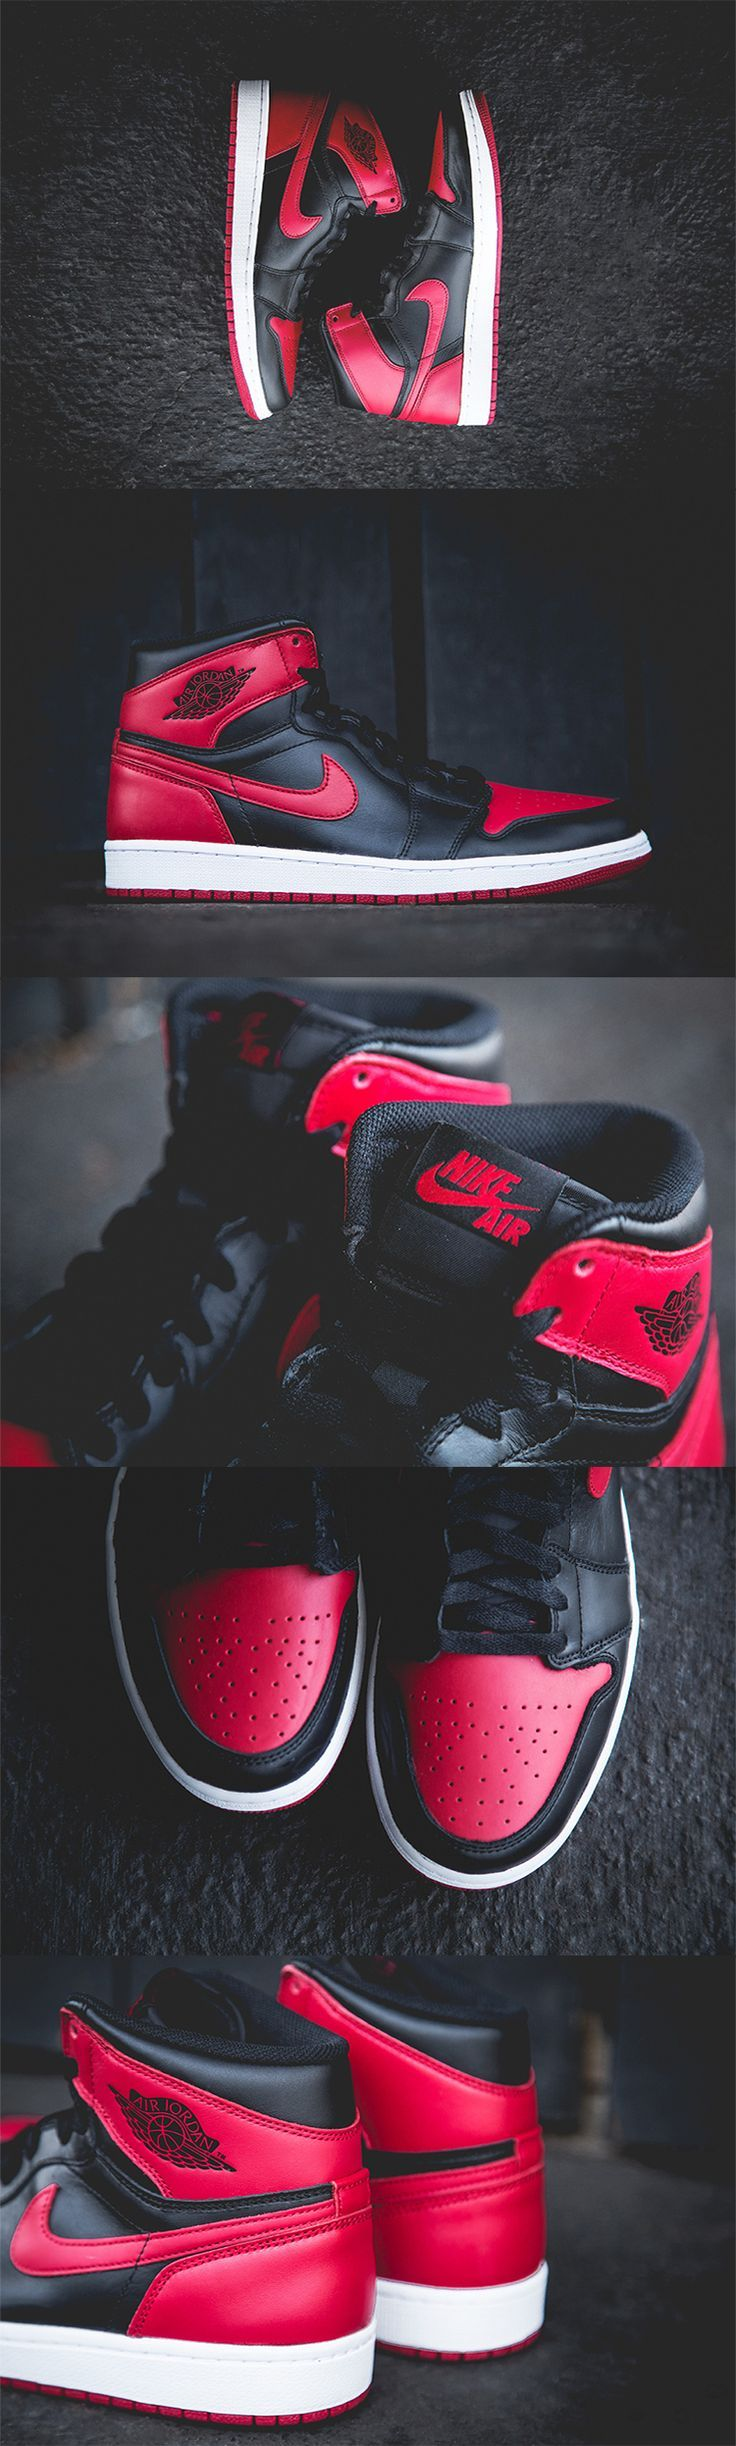 "Air Jordan 1 Retro - ""Bred"" aka my dream shoes"